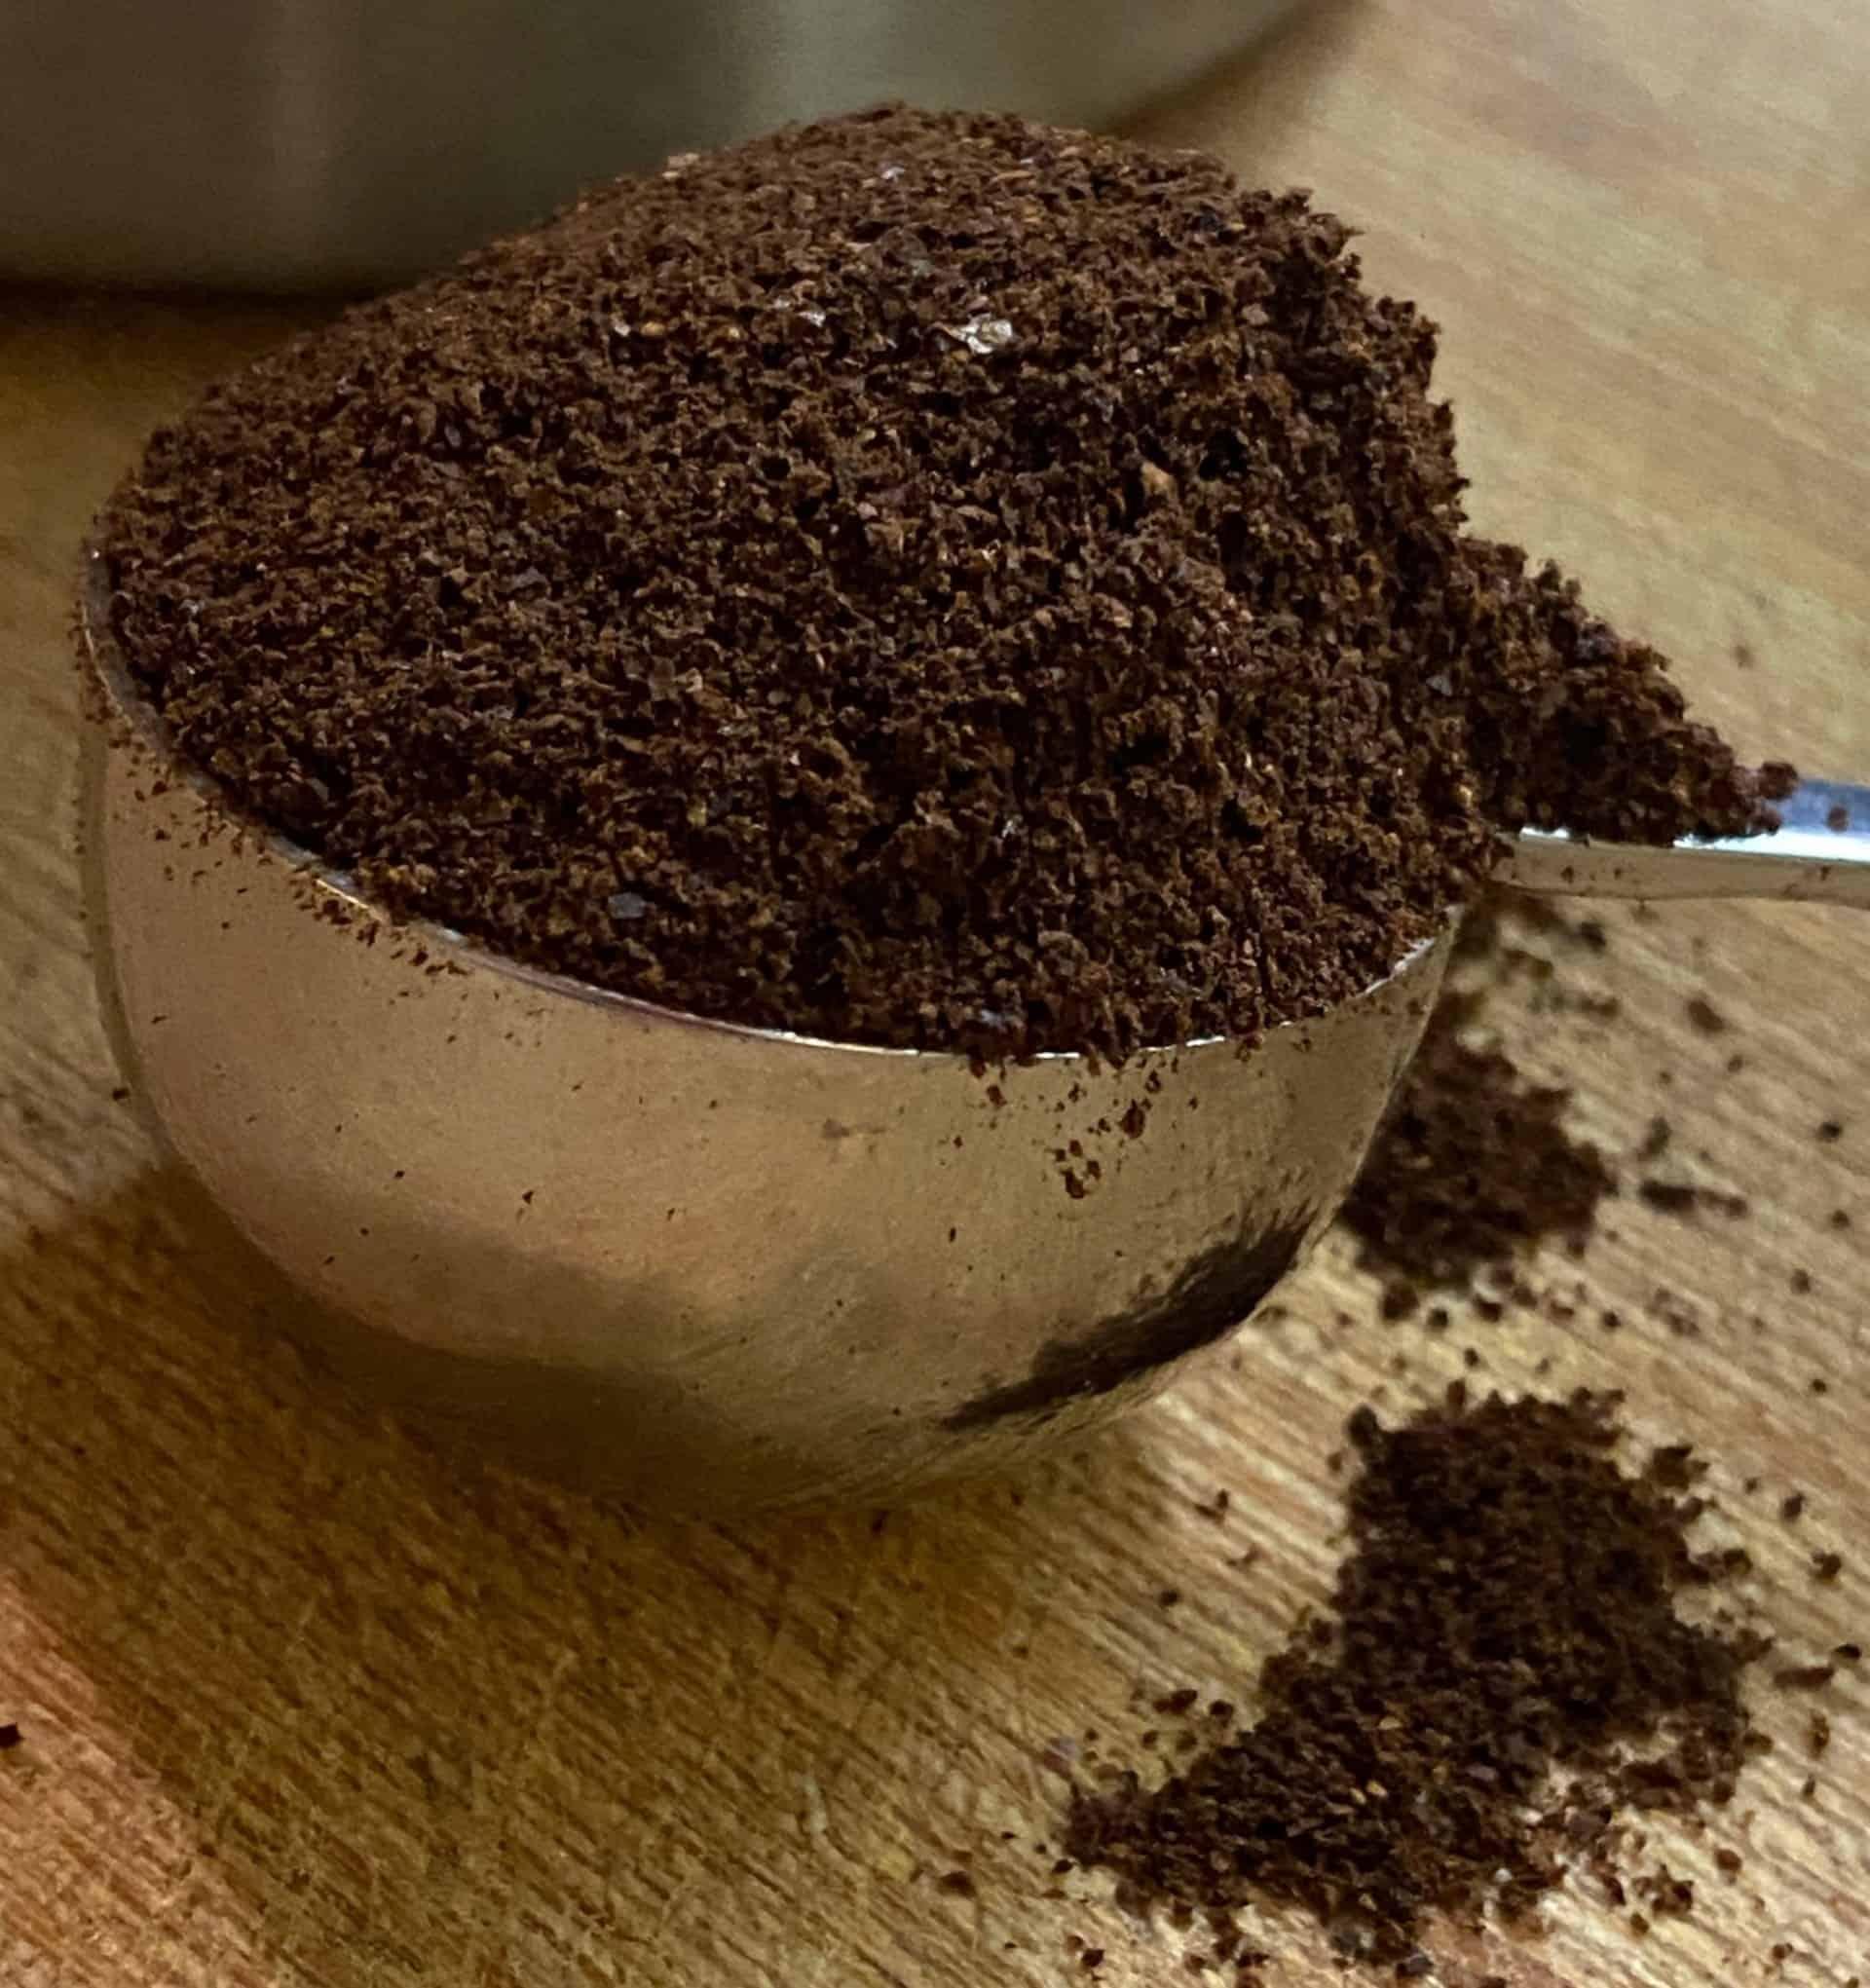 wundervoller Kaffee im Kaffeelot